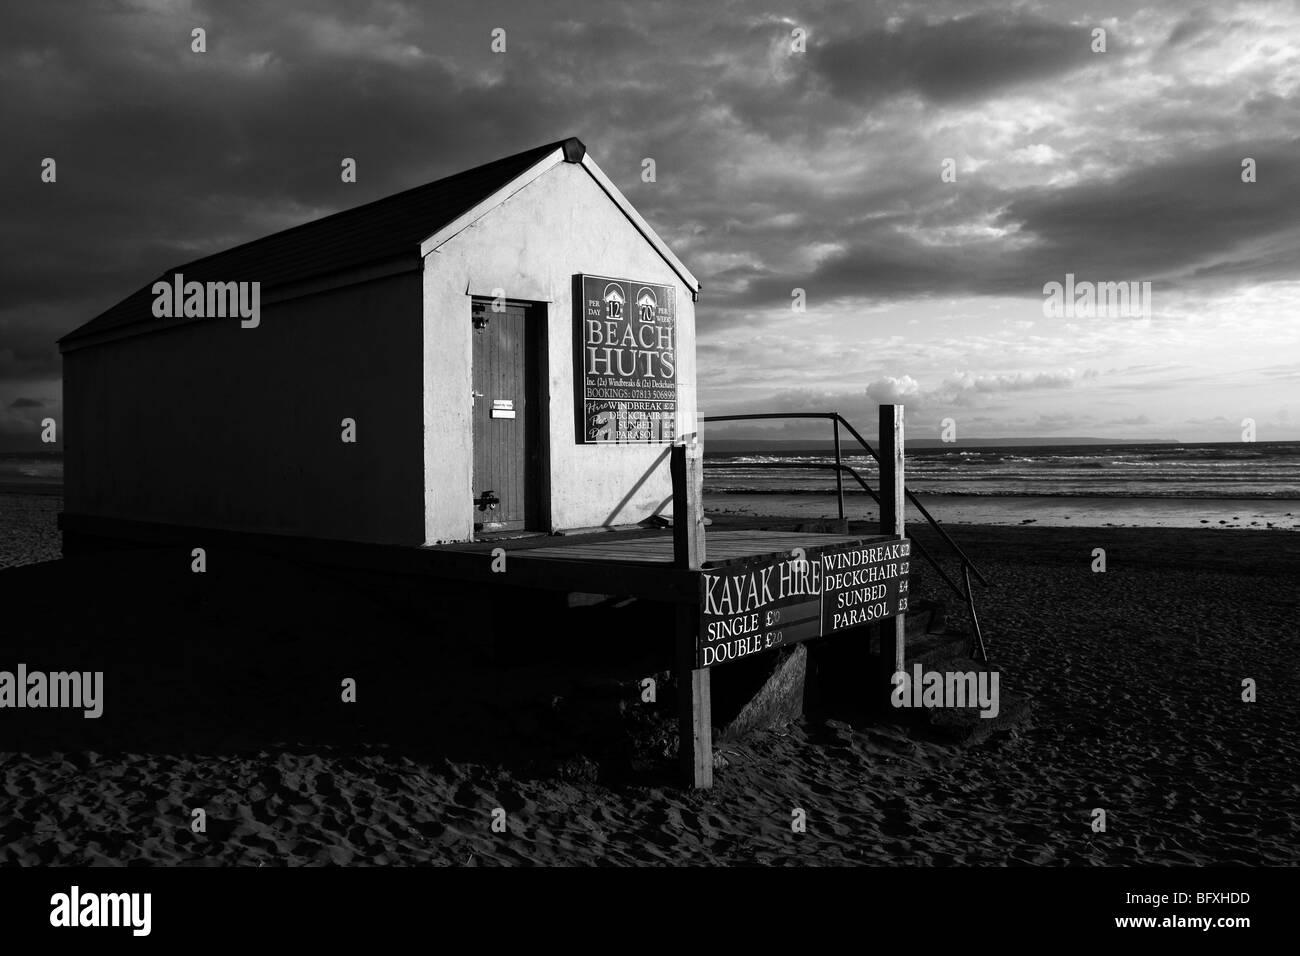 Interesting Black & White Beach Hut Image - Stock Image